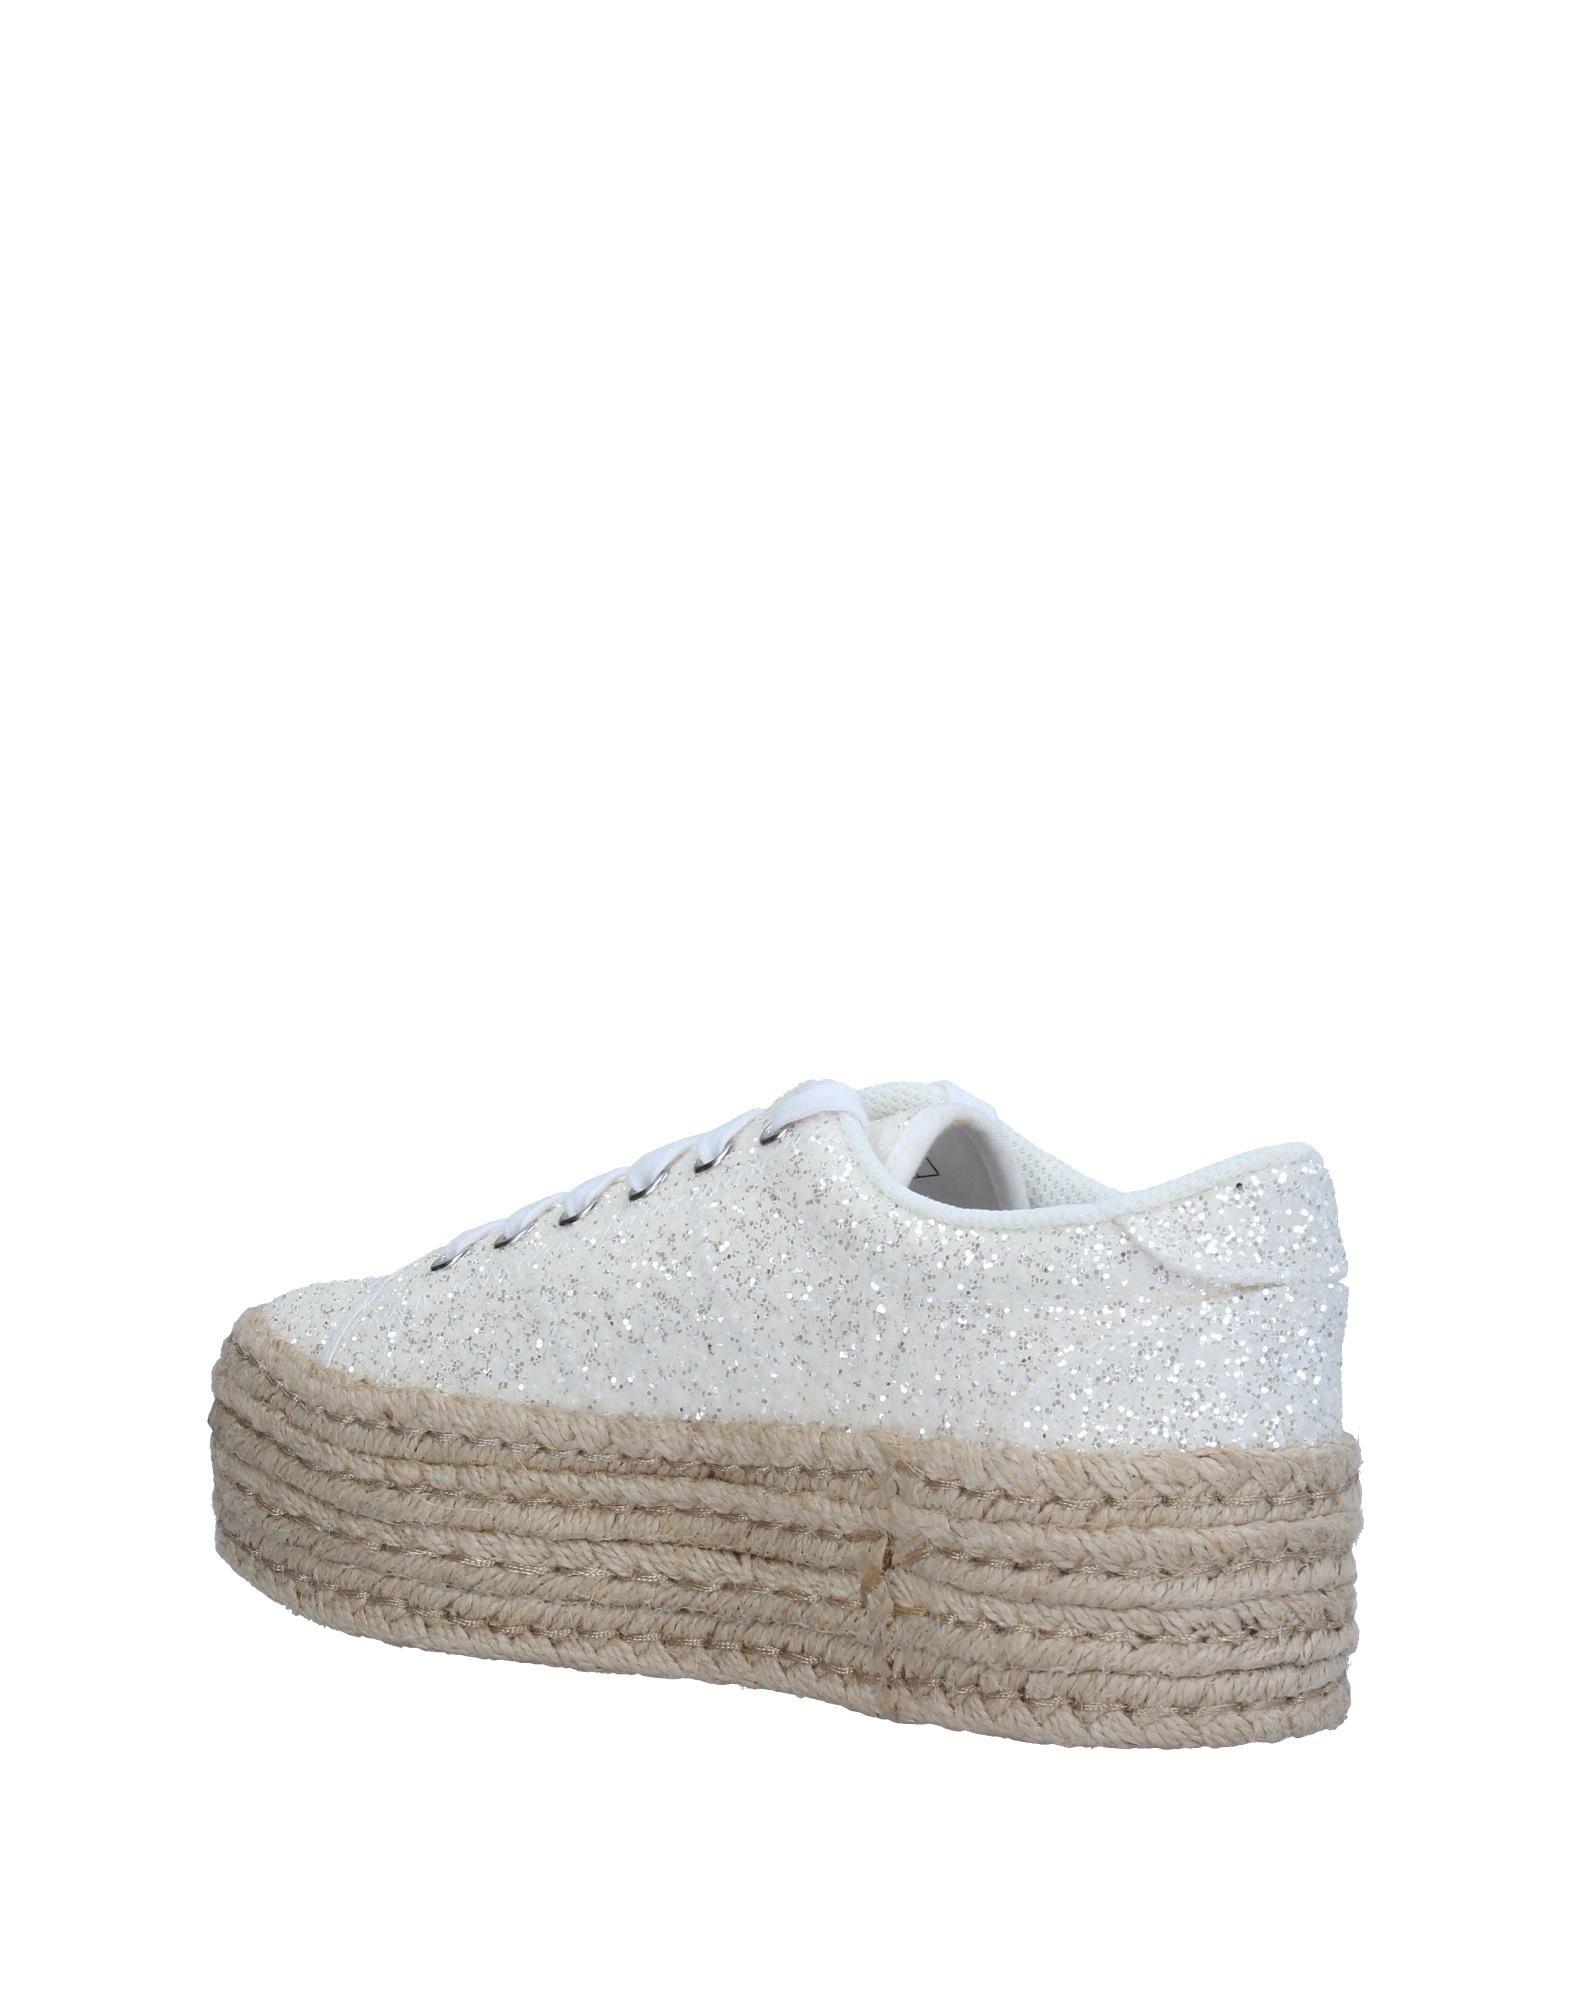 Jc Play By Sneakers Jeffrey Campbell Sneakers By Damen  11329033HX Heiße Schuhe 0bd28d